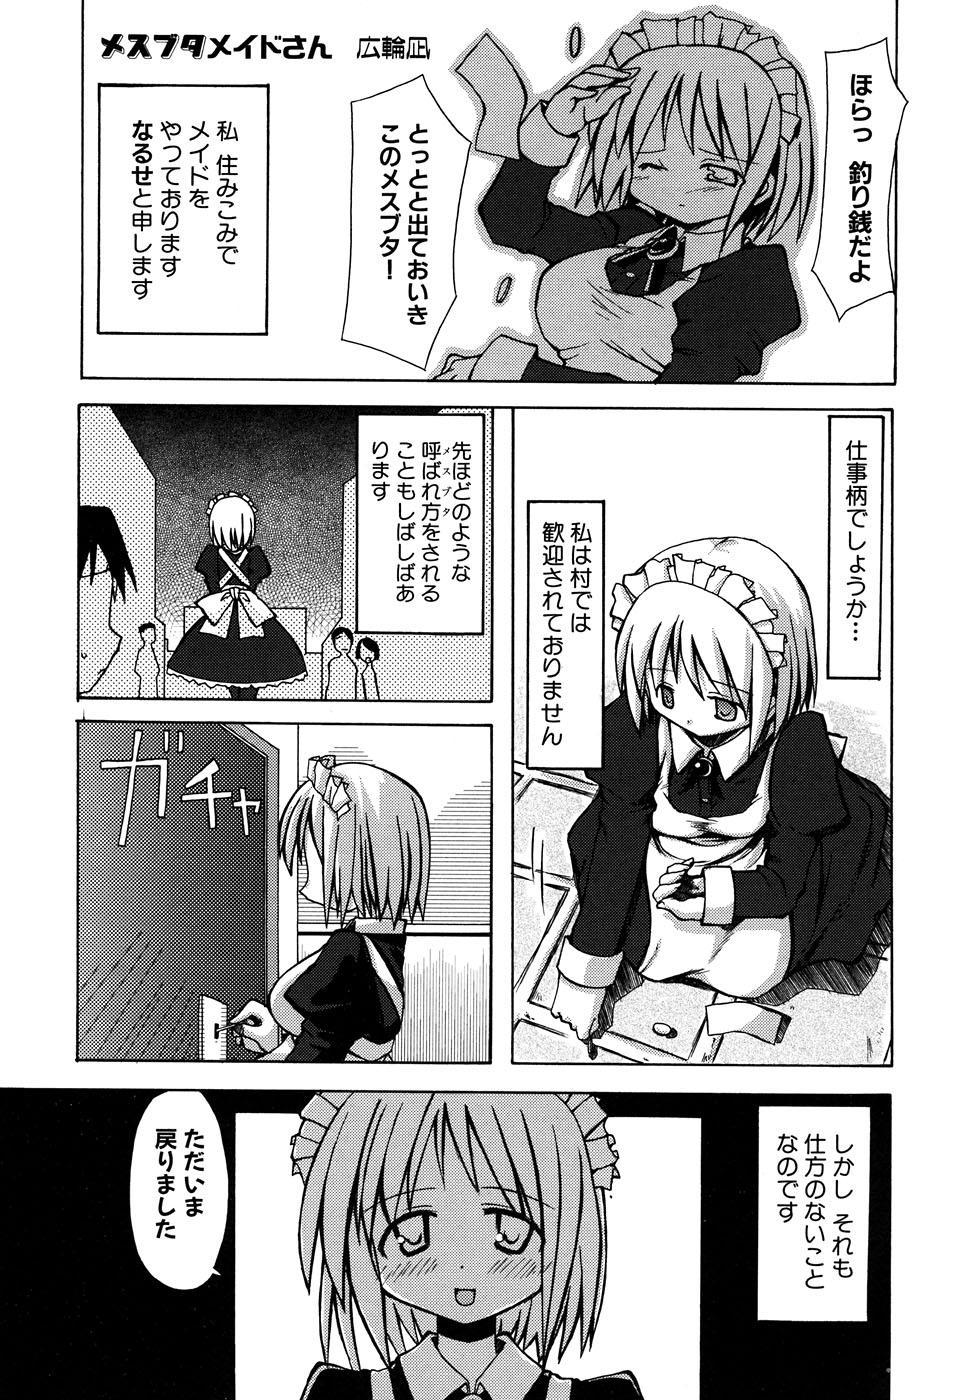 Fechikko VS Series ROUND.2 Miko San VS Maid San 135